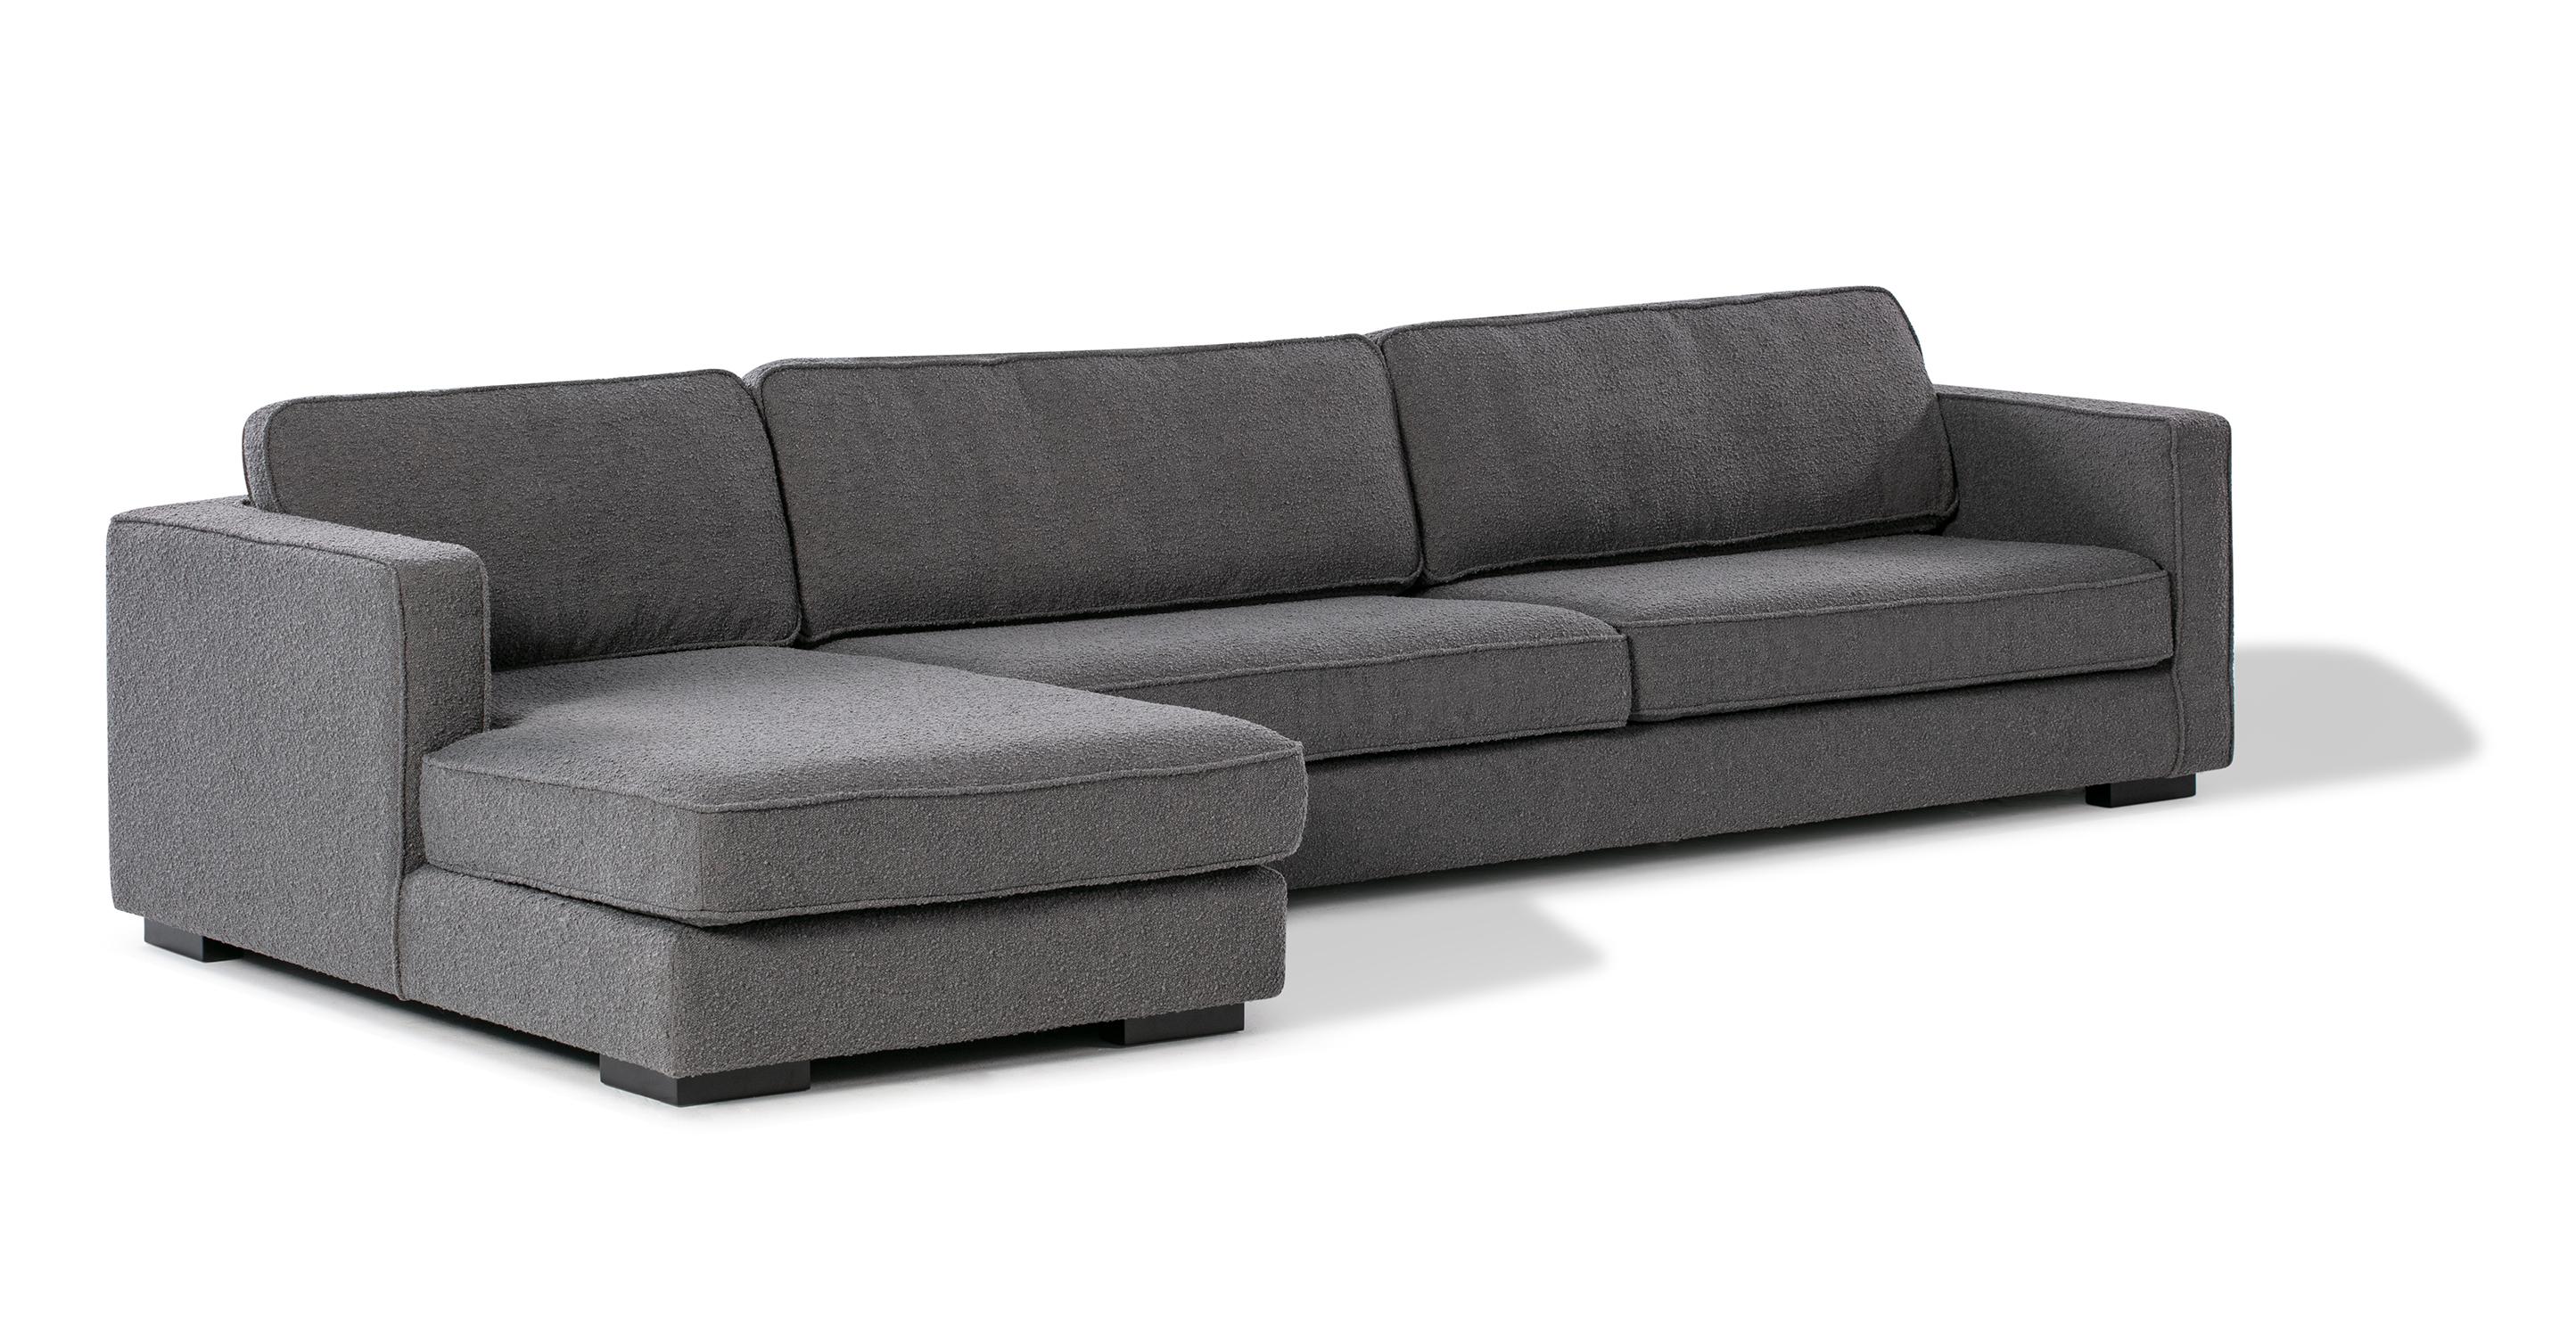 "Architect 133"" Fabric Sofa Sectional Left, Gris Boucle"